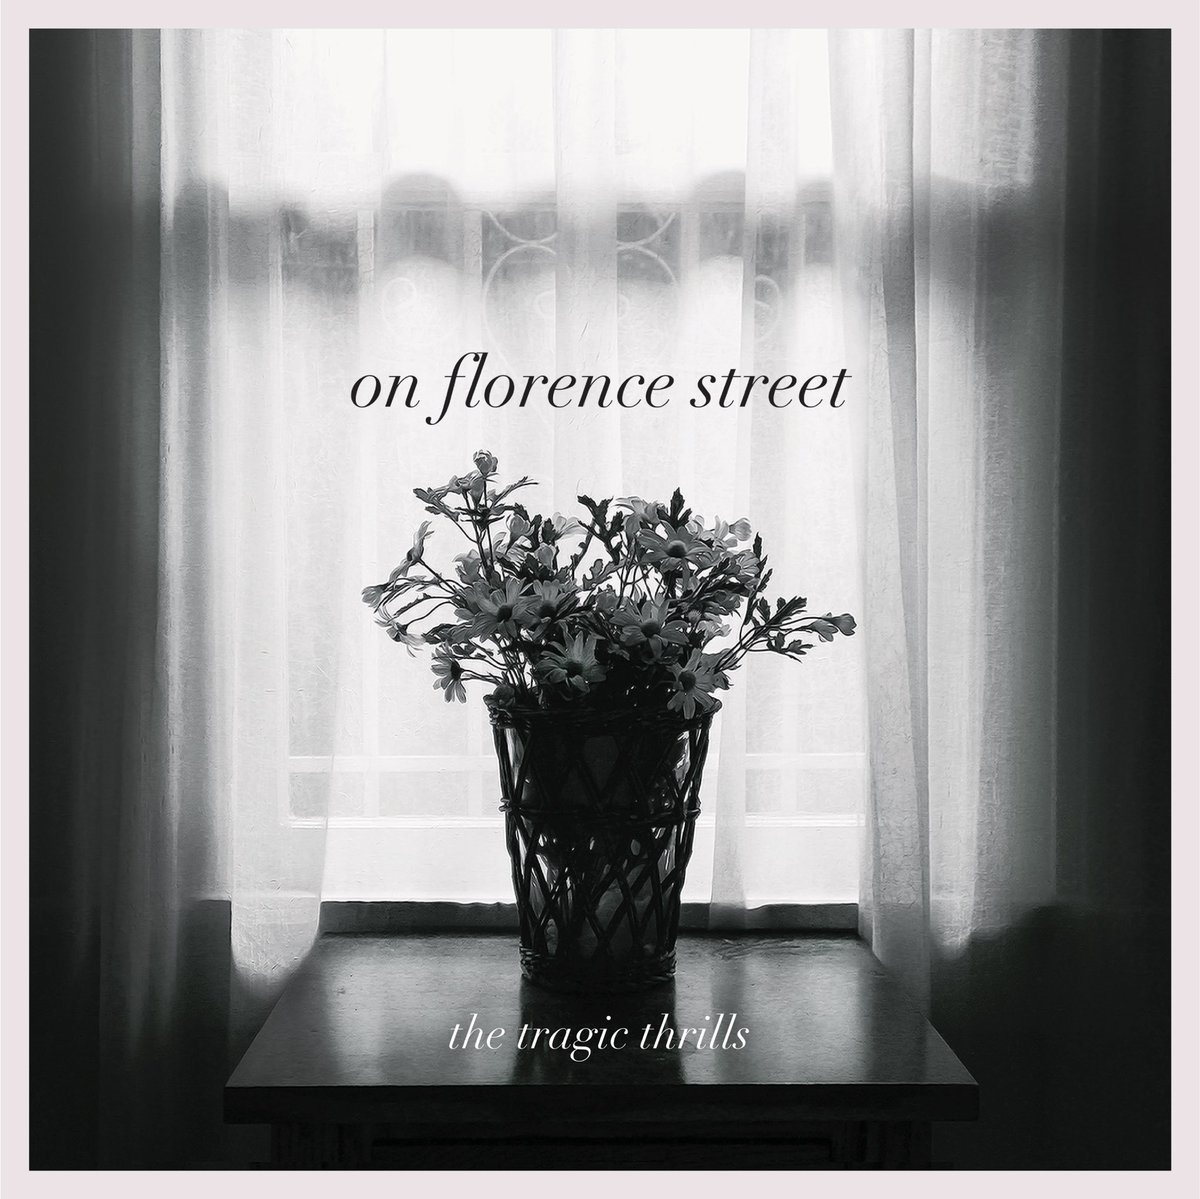 On Florence Street, The Tragic Thrills